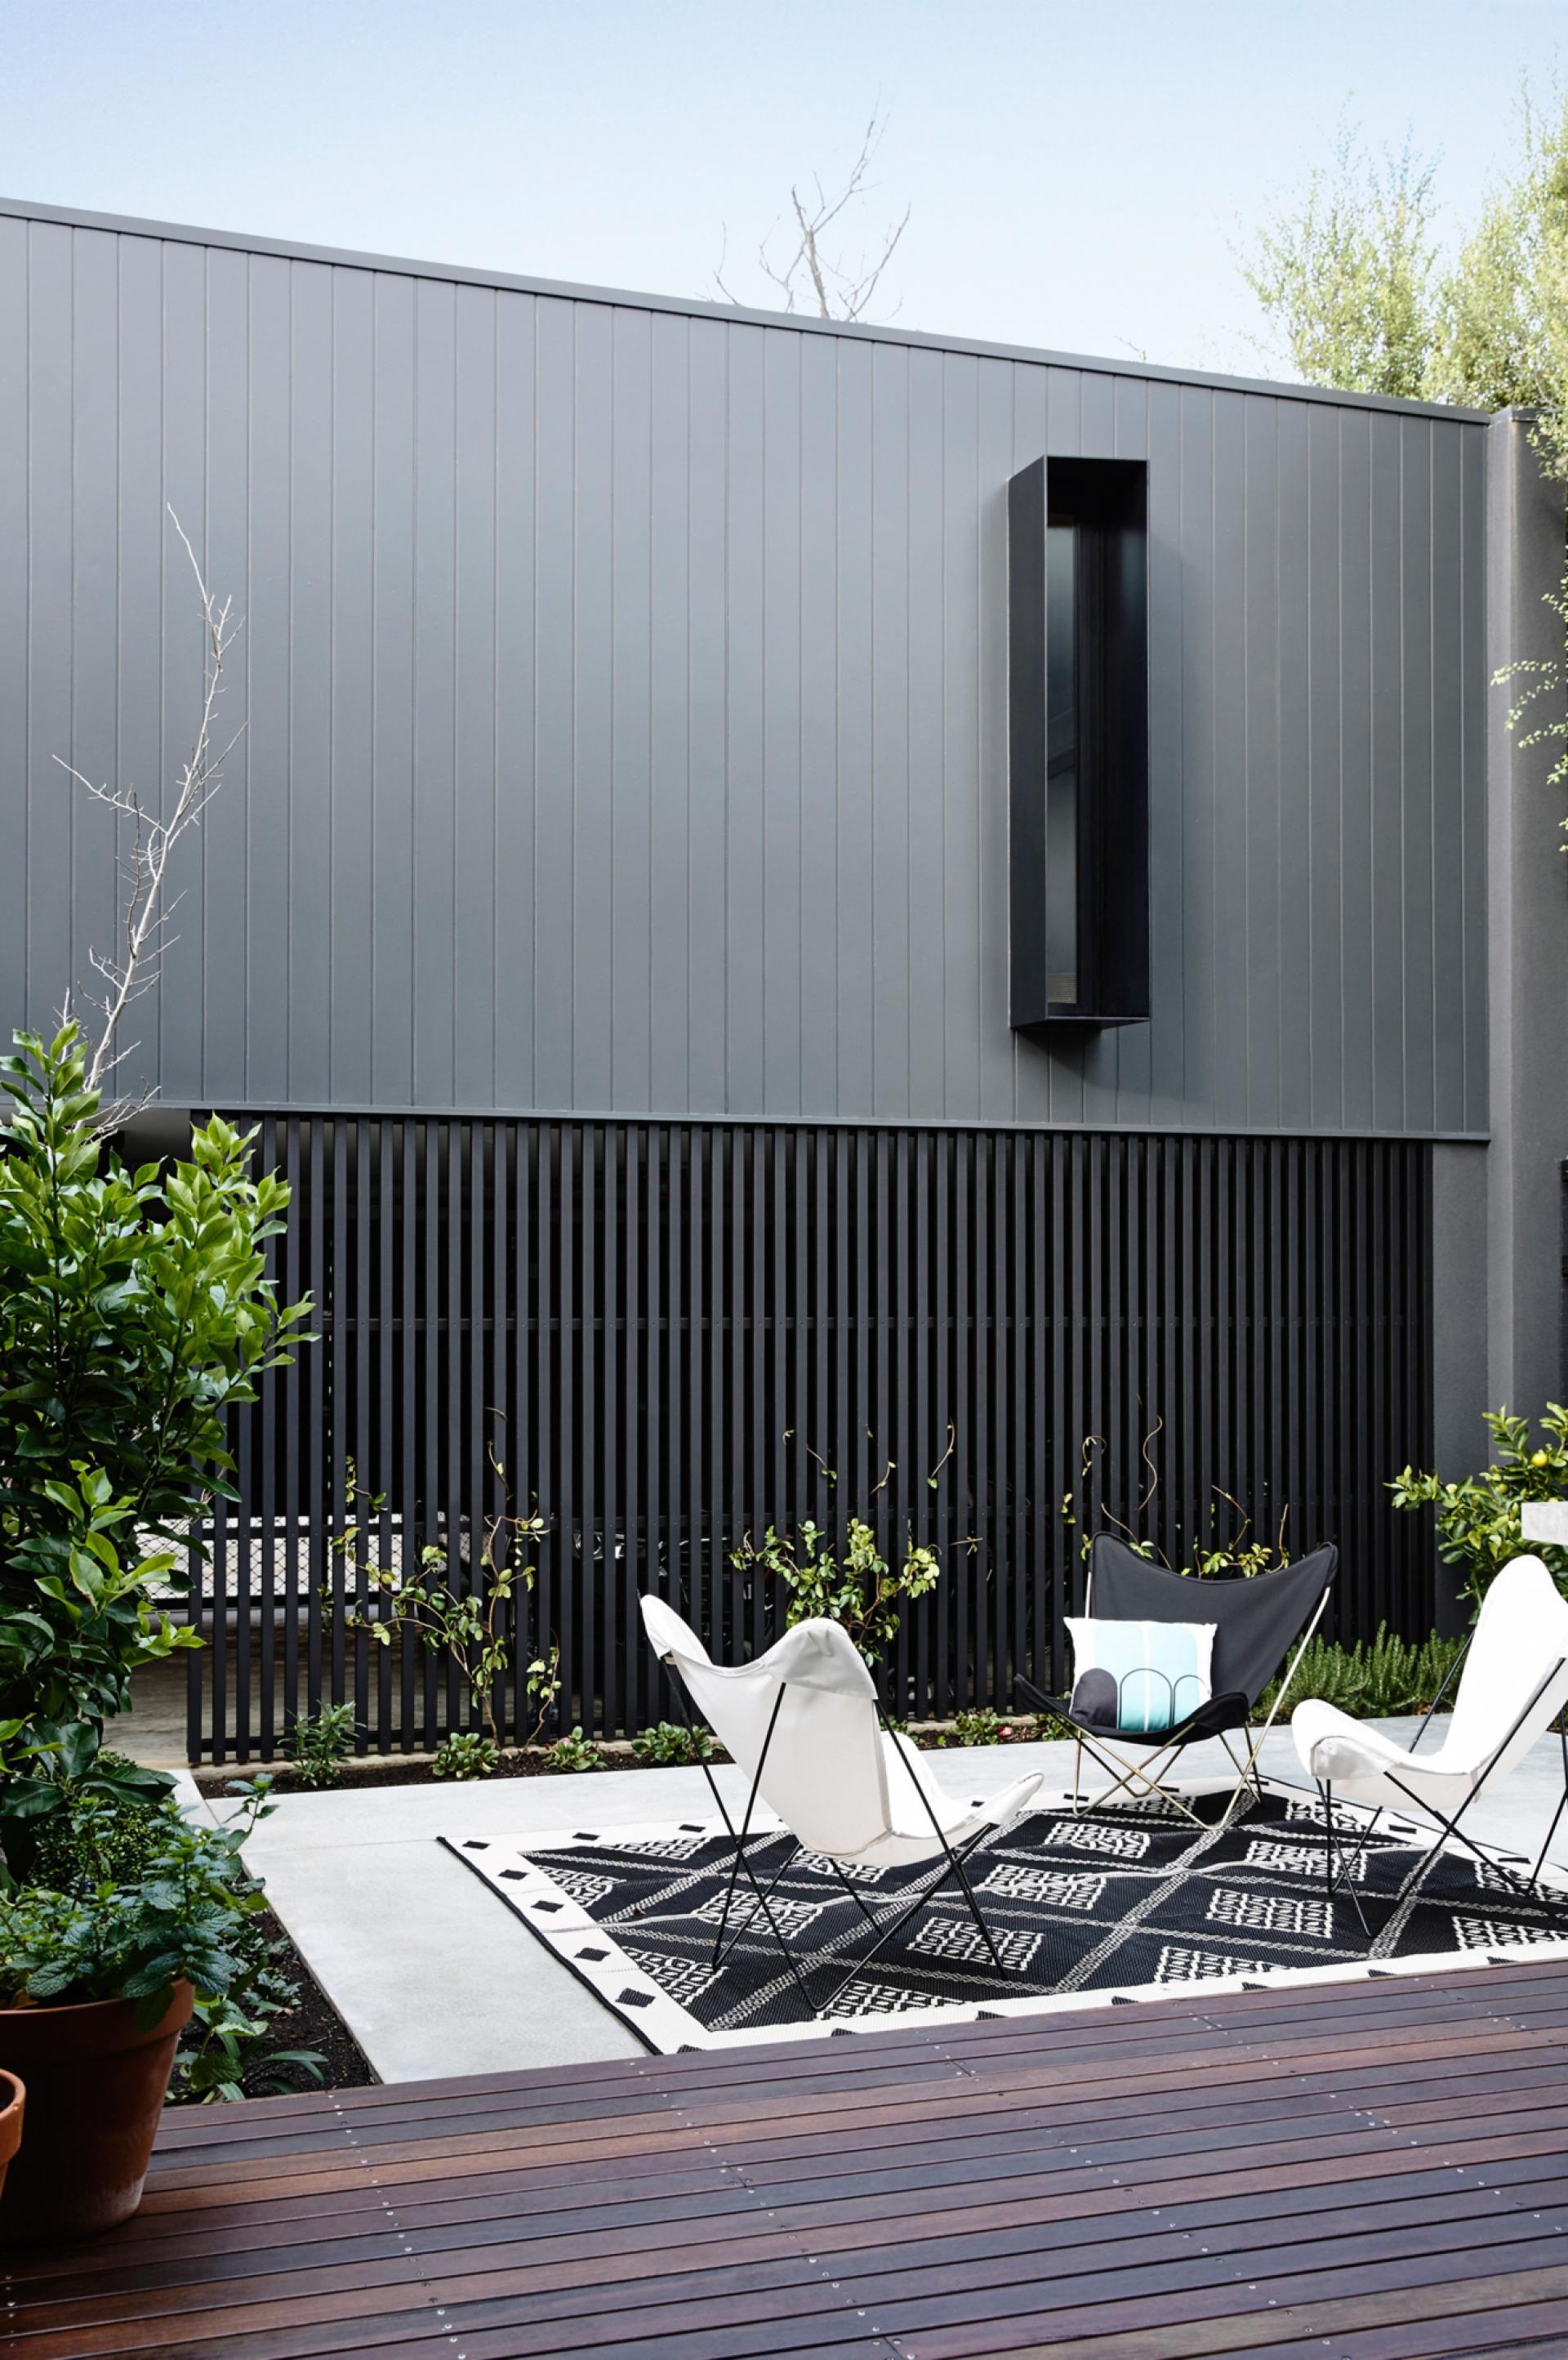 Townhouse + yoga studio = inner city oasis. Photography by Derek Swalwell. Designed by Inform Design (informdesign.com.au).